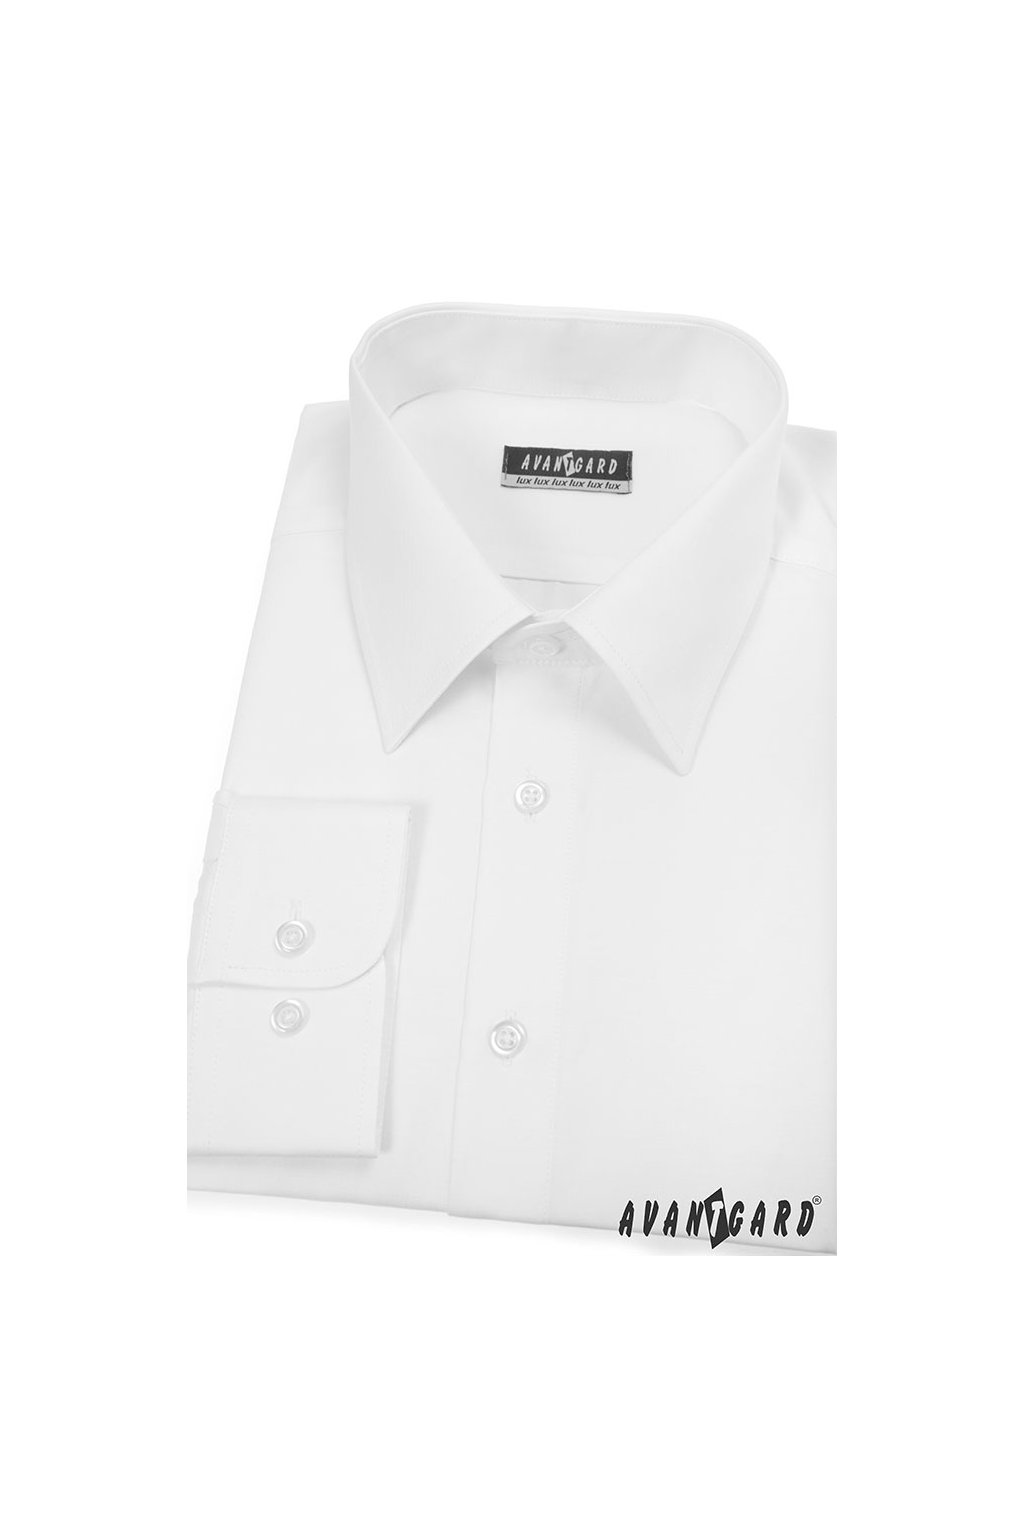 Pánská košile bílá 511 - 1